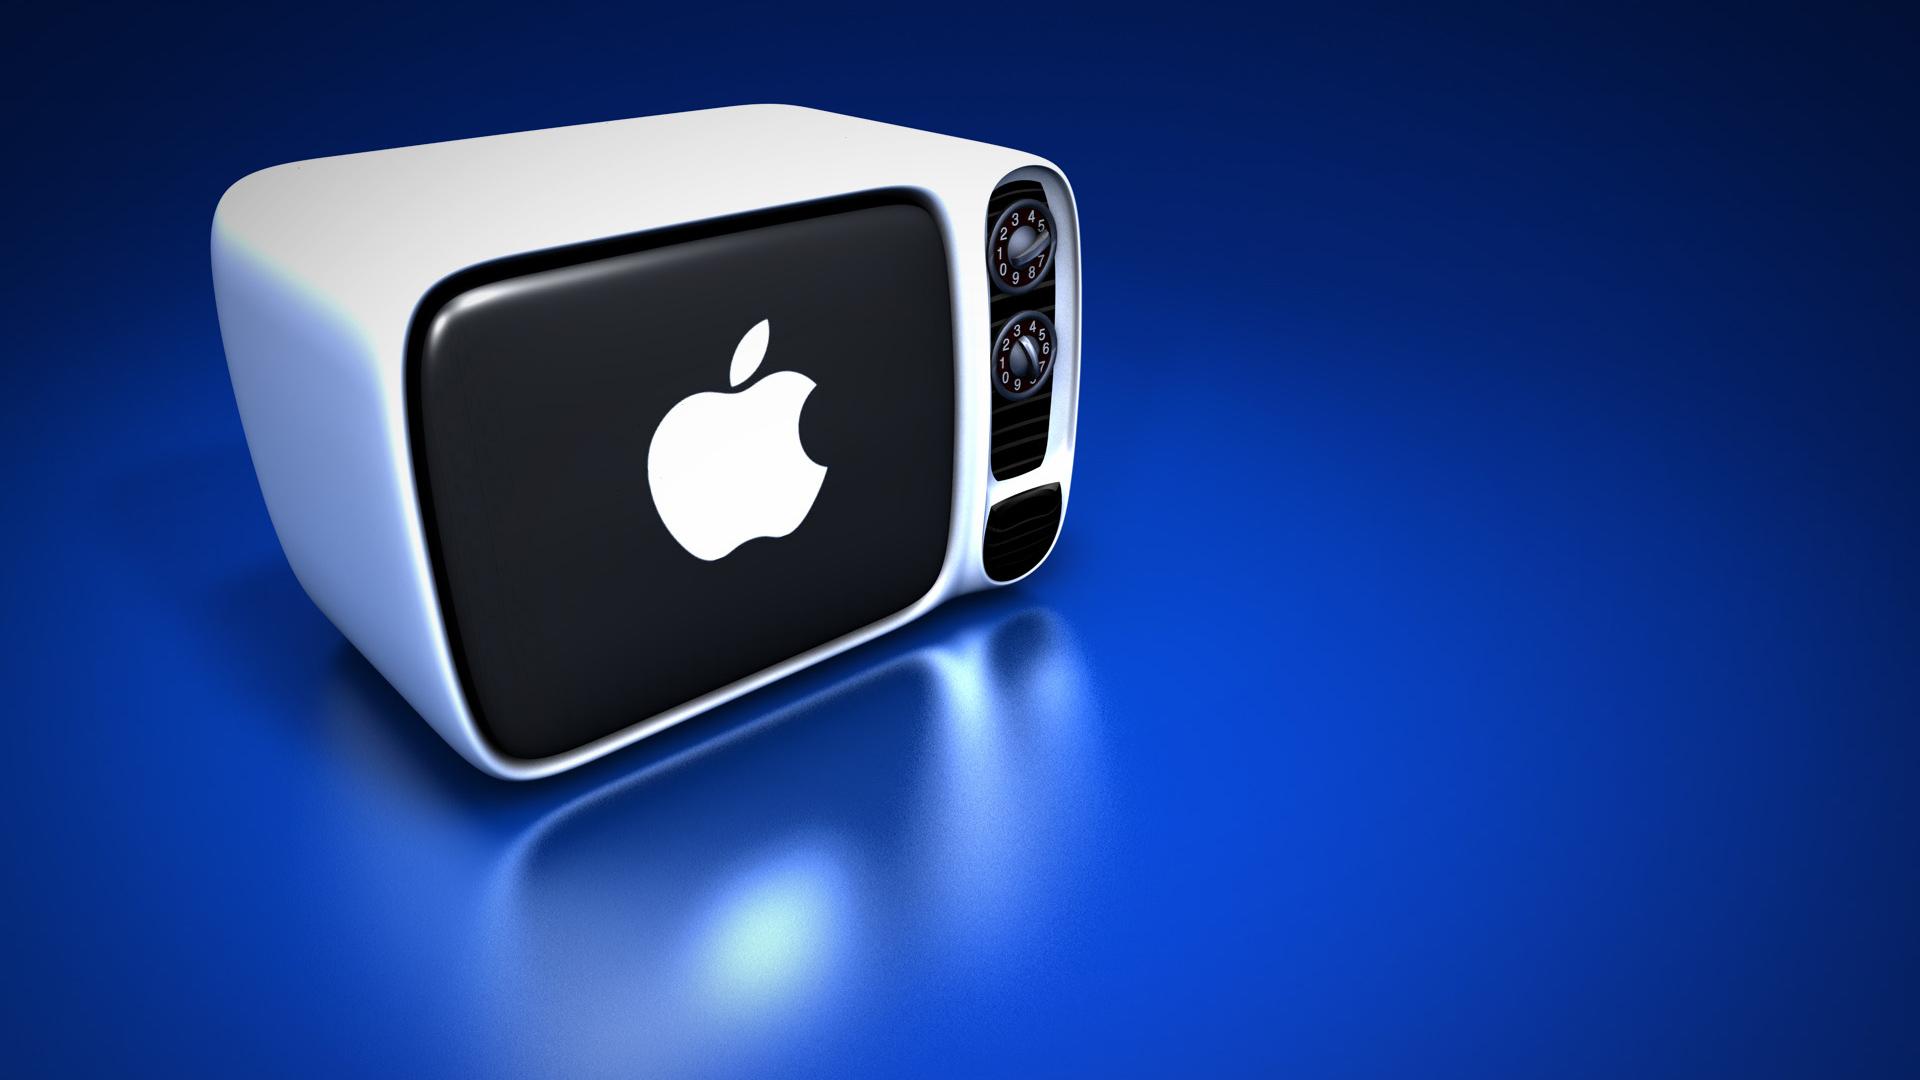 Apple-Tv-wallpaper-wpc9002318